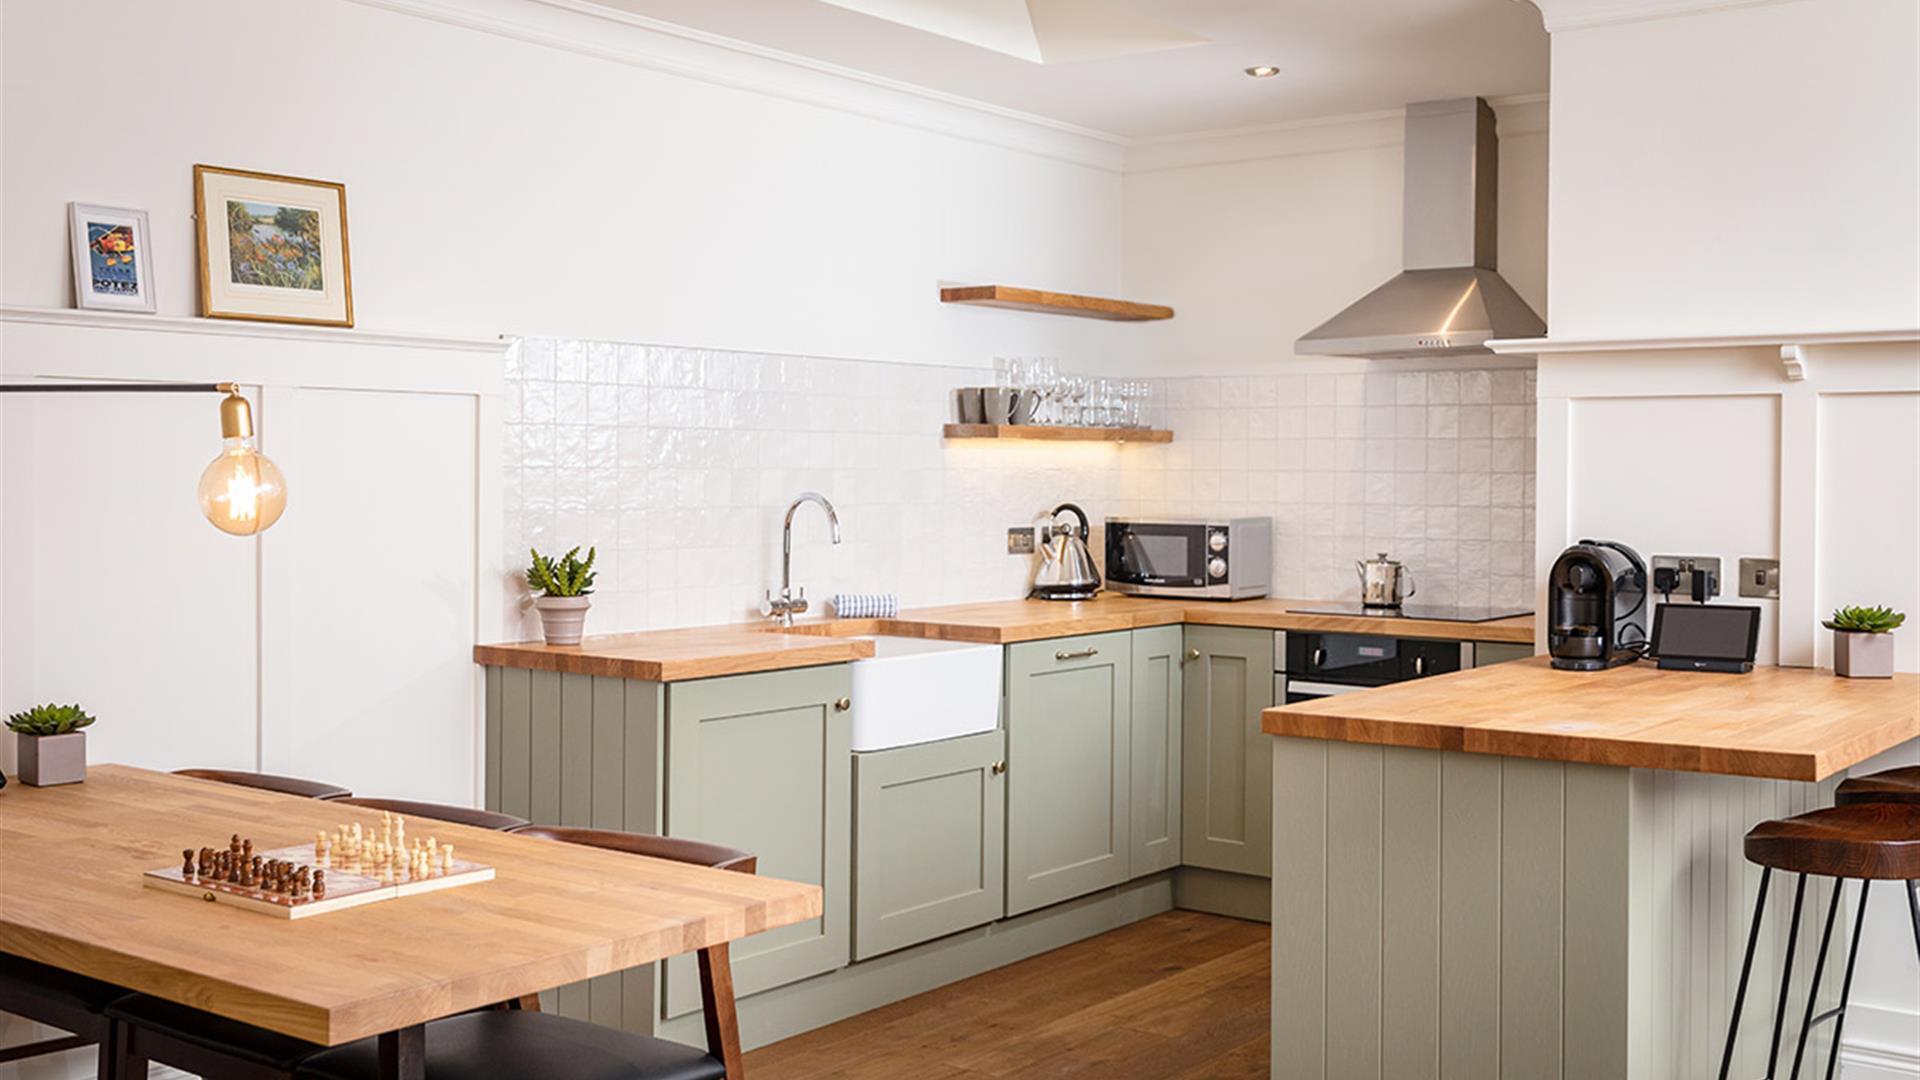 Cottage Suite kitchen facilities at Galgorm